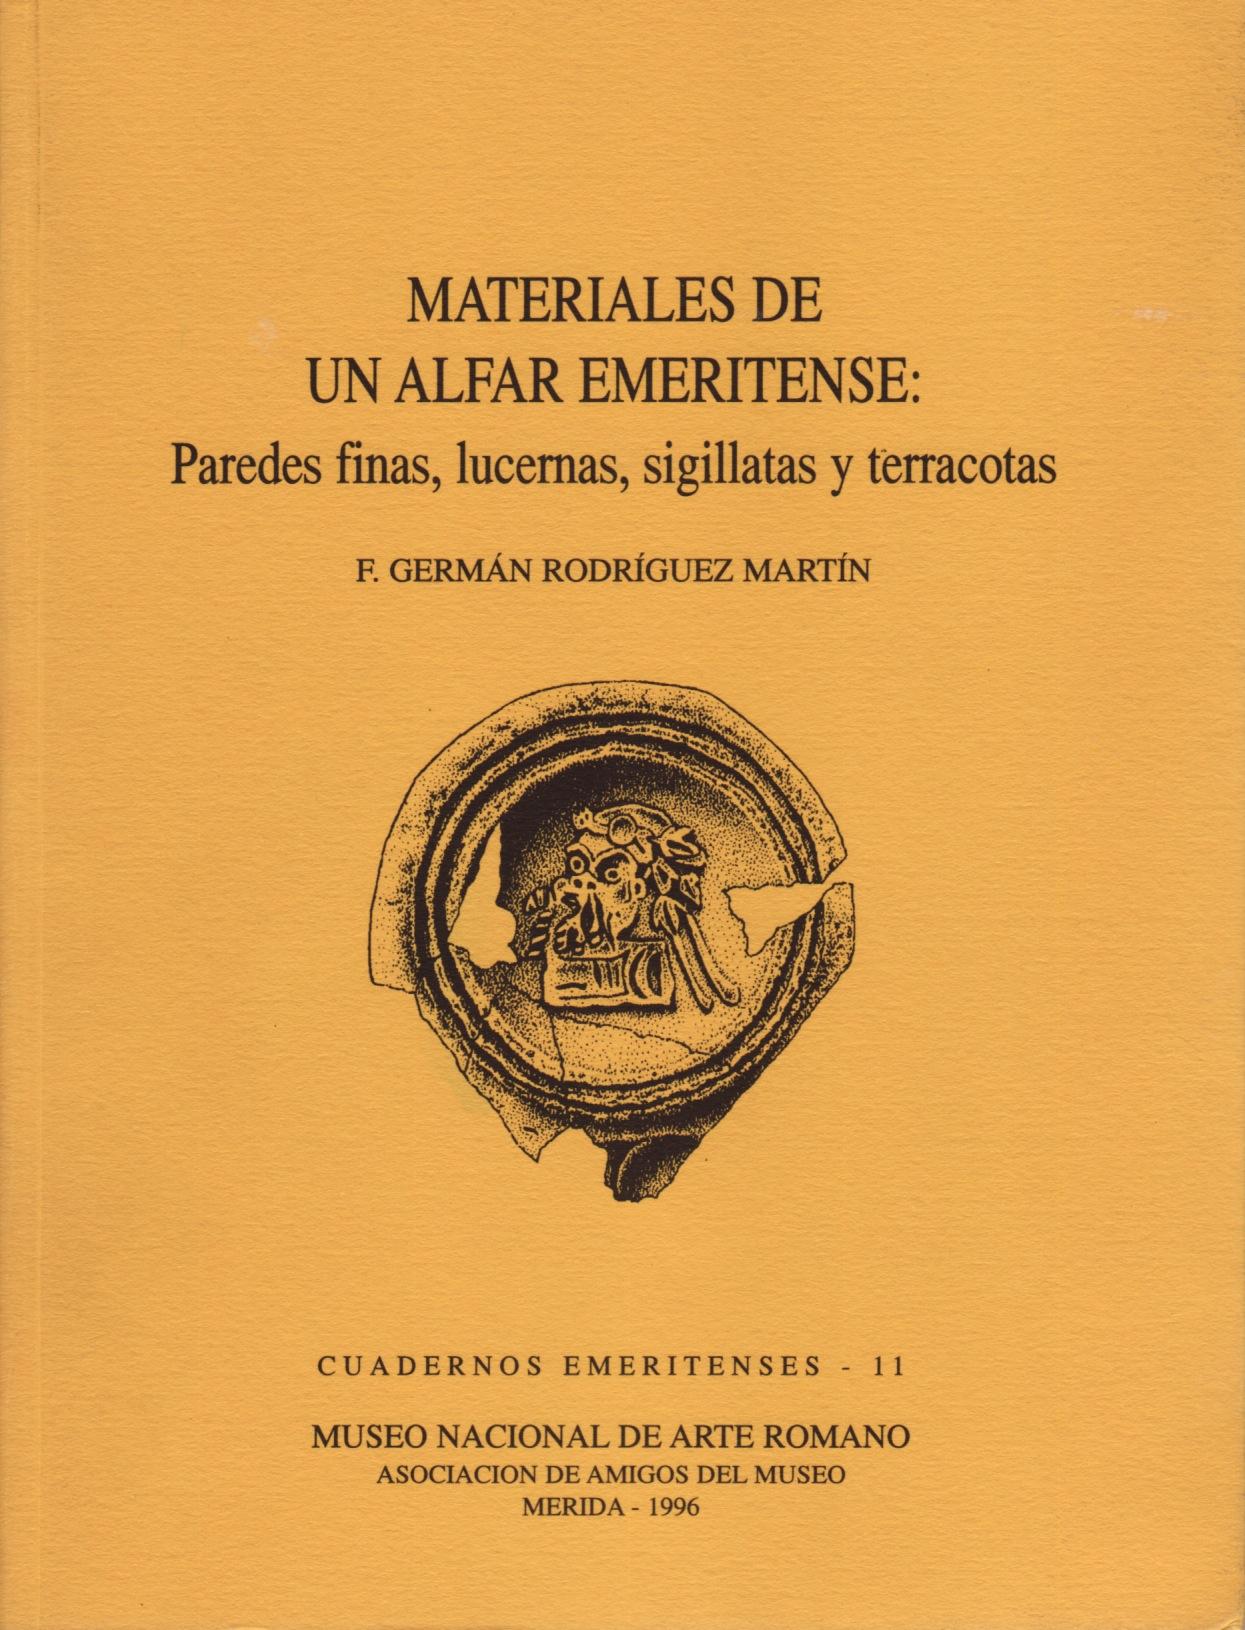 Rodriguez Martin 1996